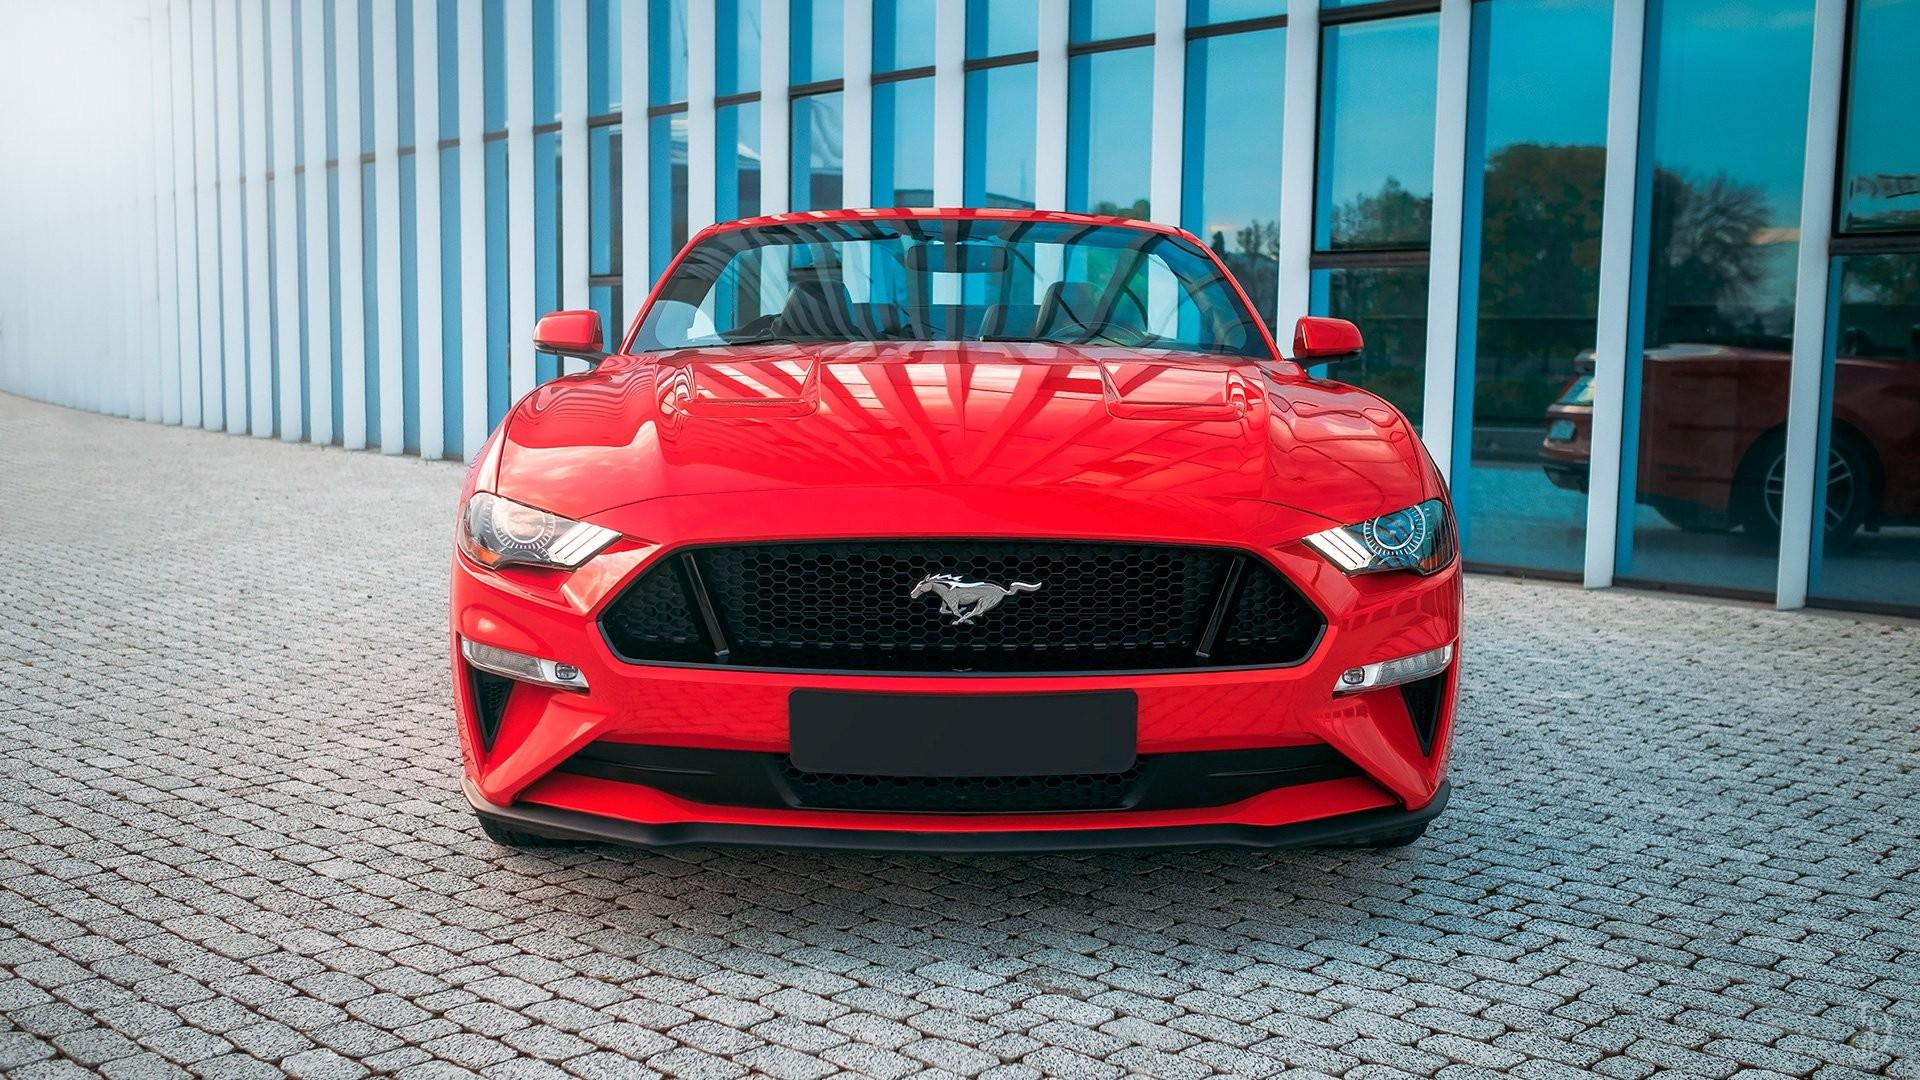 Аренда Ford Mustang GT 5.0  в Москве. Фото 5